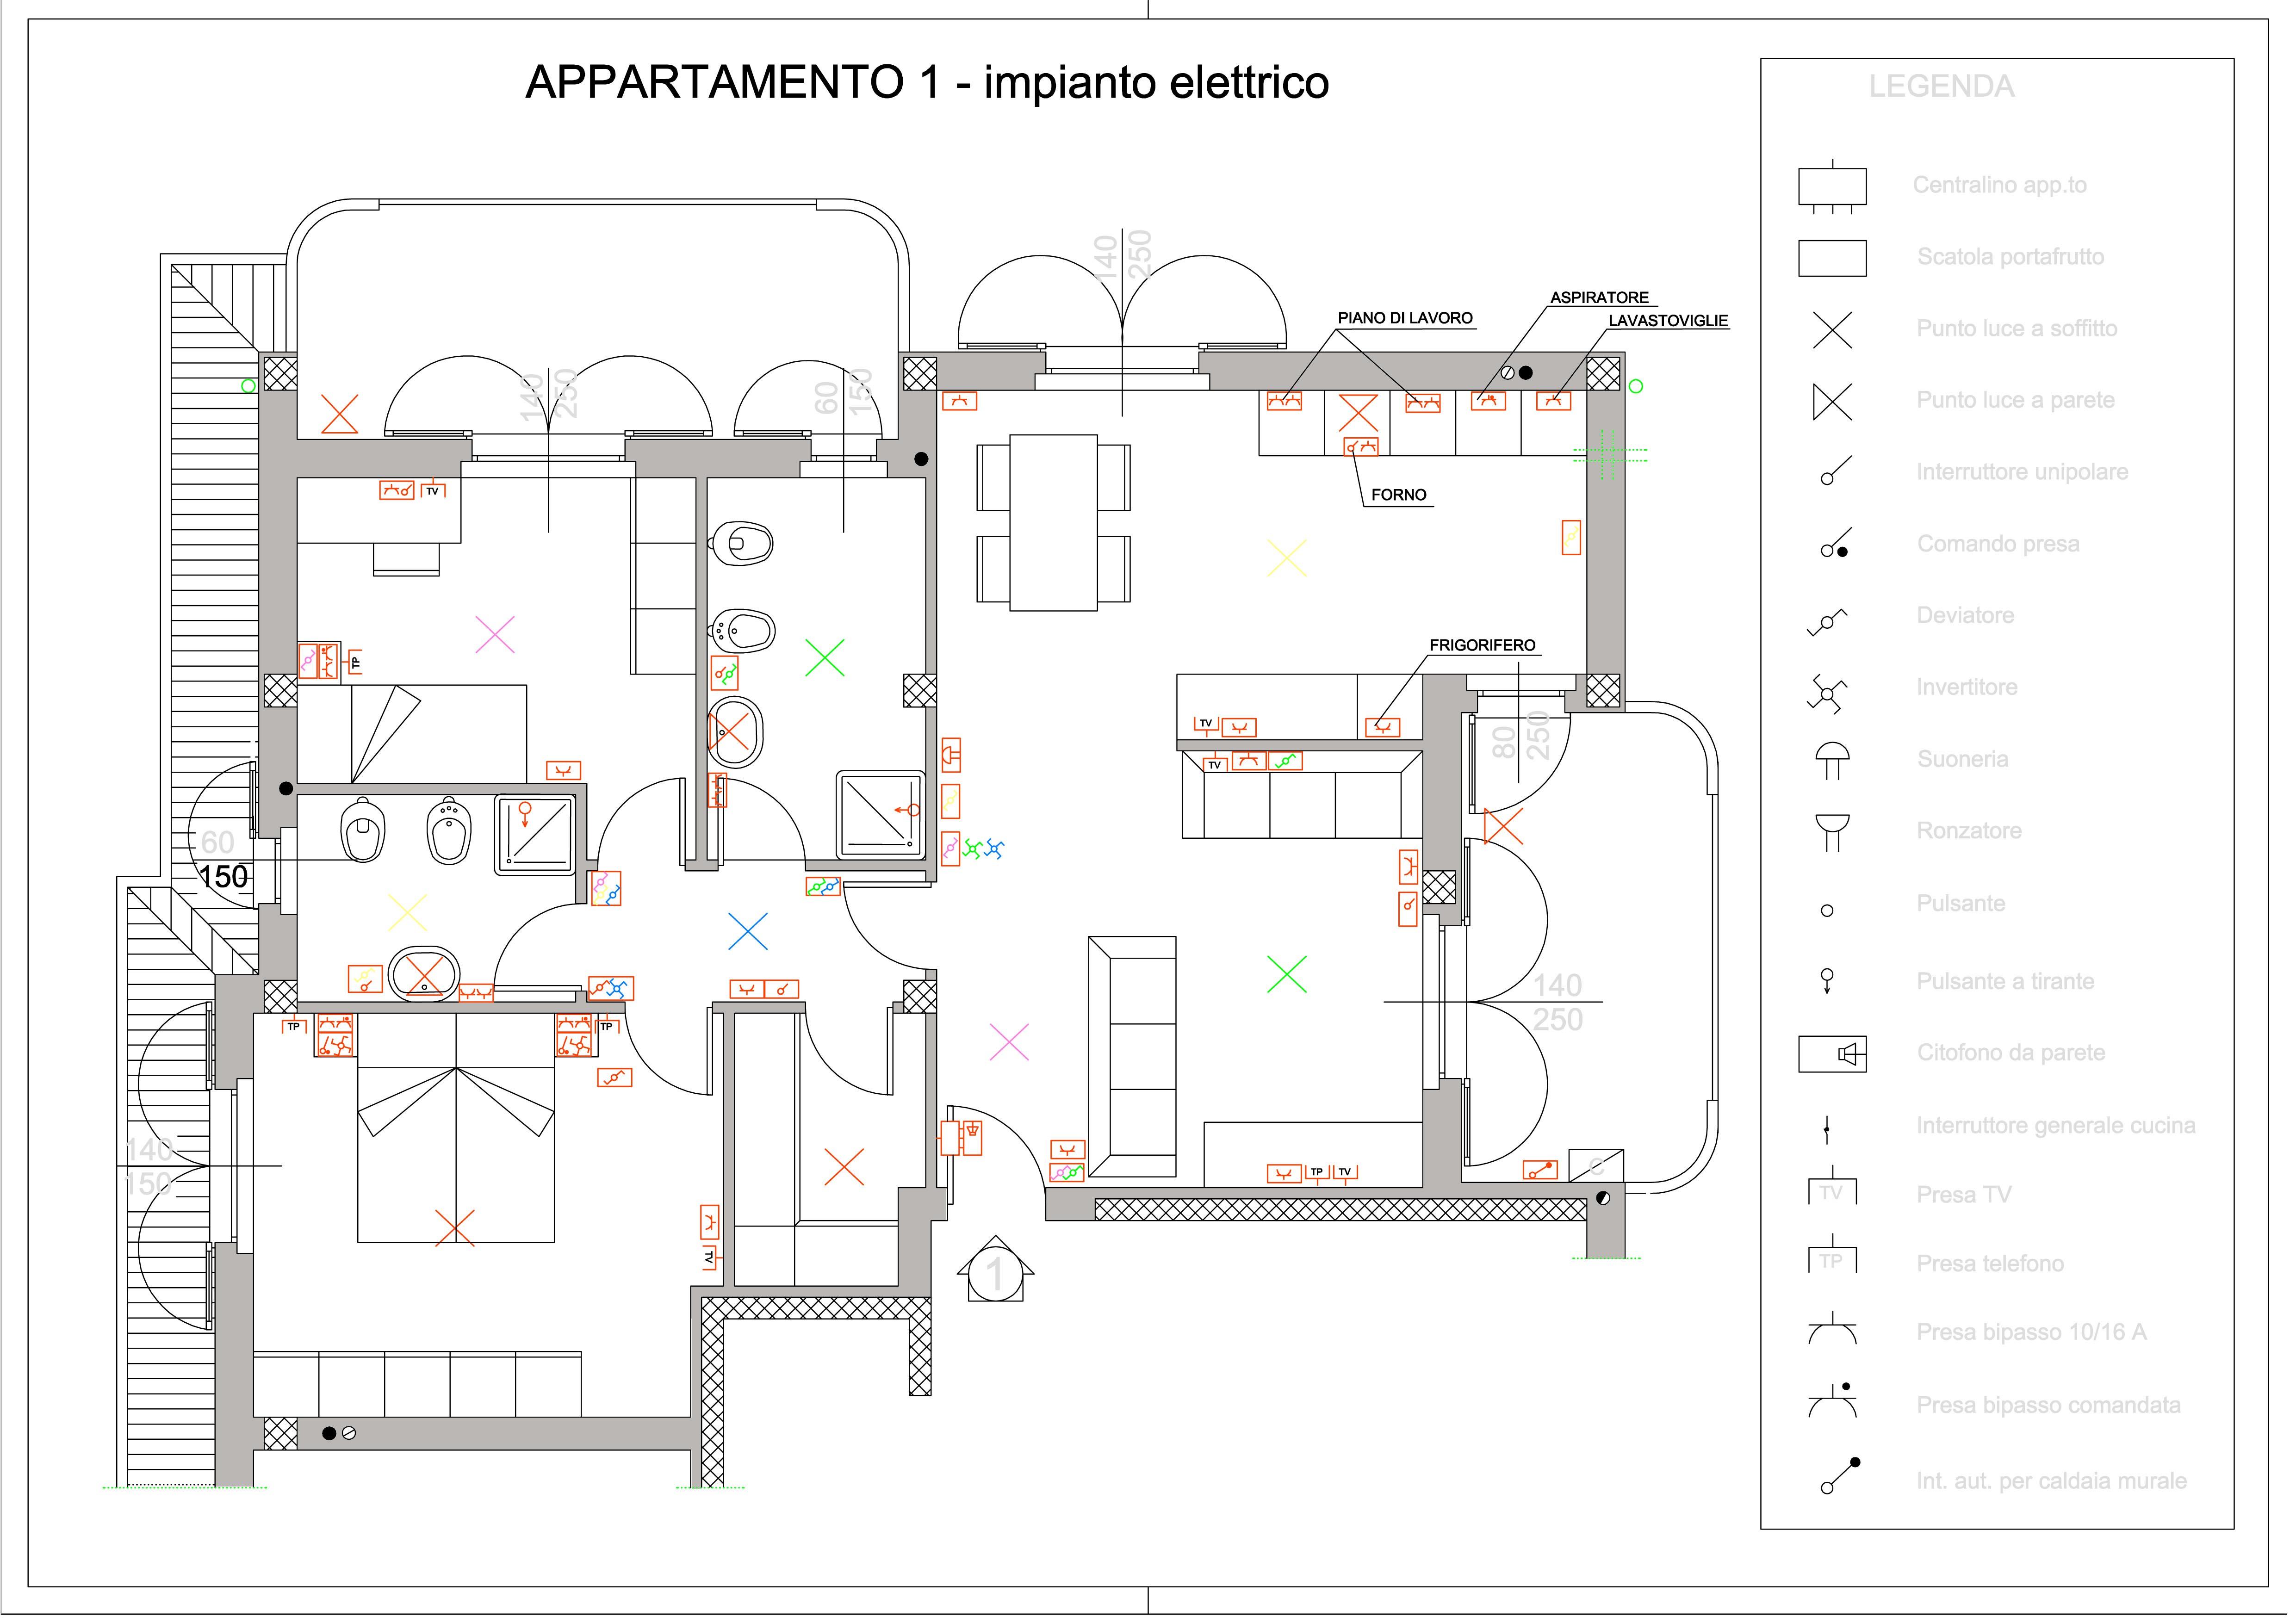 Impianti elettrici schemi fabulous schema elettrico for Schema impianto elettrico casa